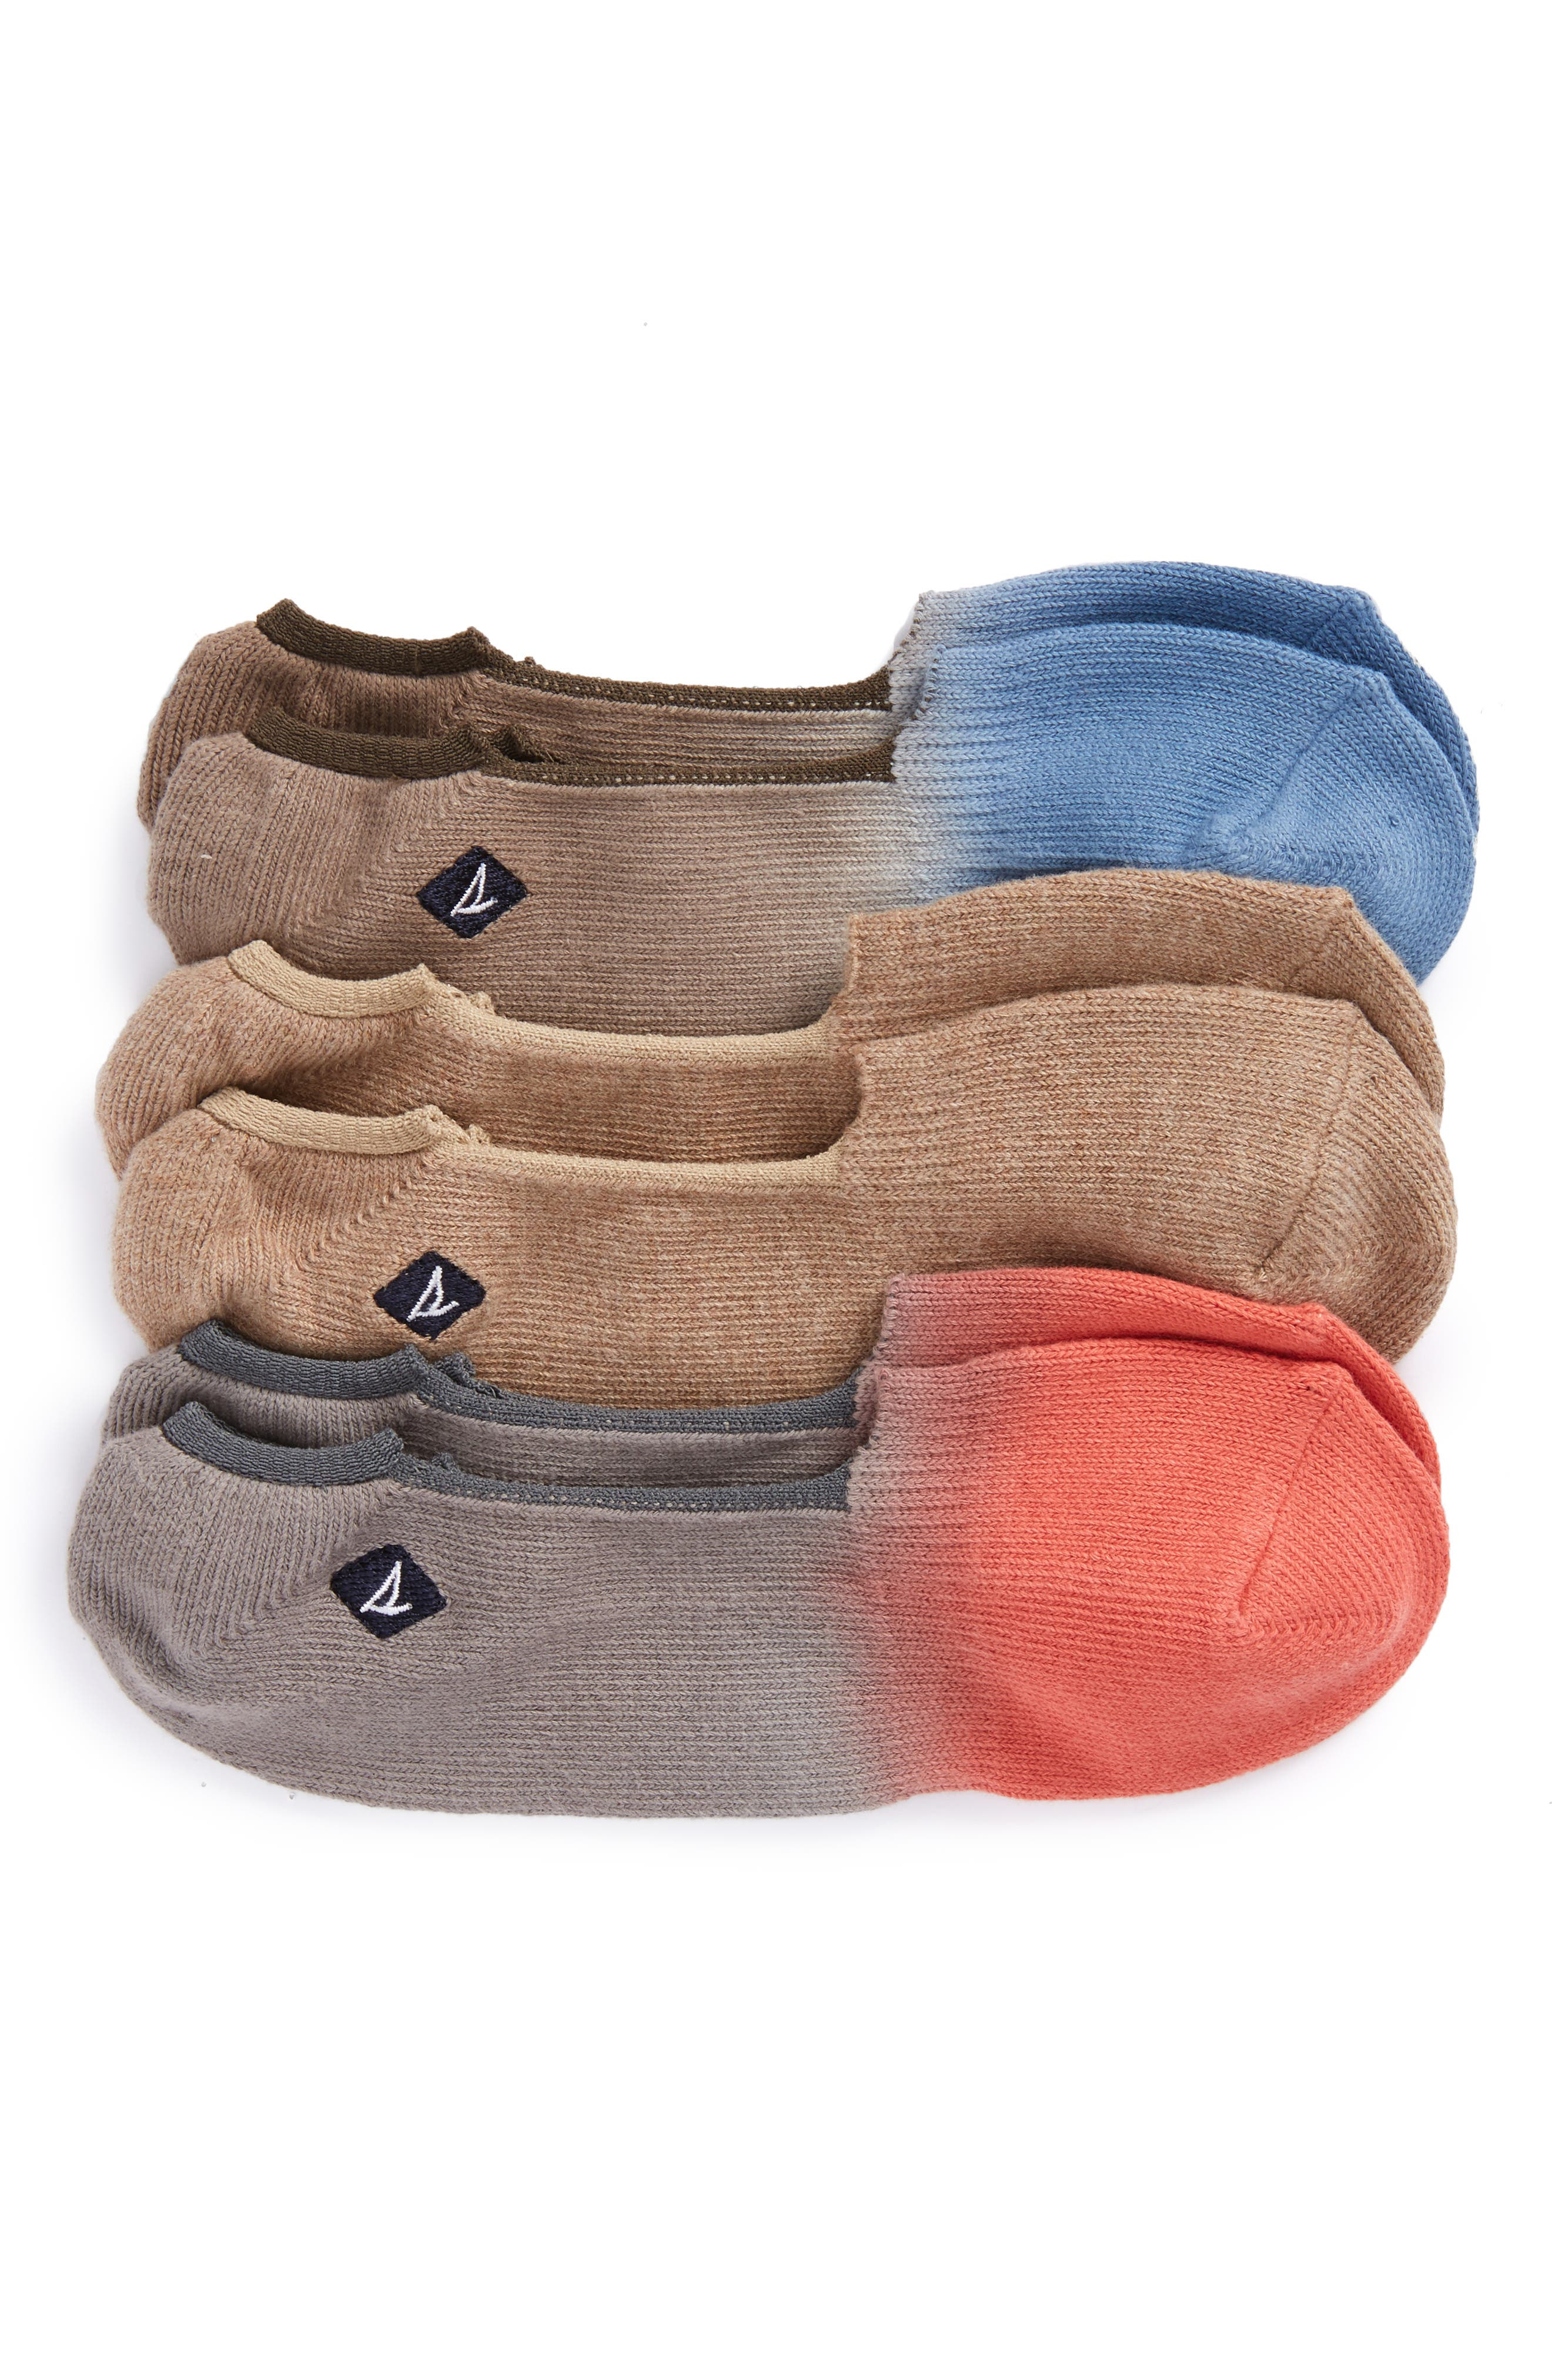 3-Pack Liner Socks,                             Main thumbnail 1, color,